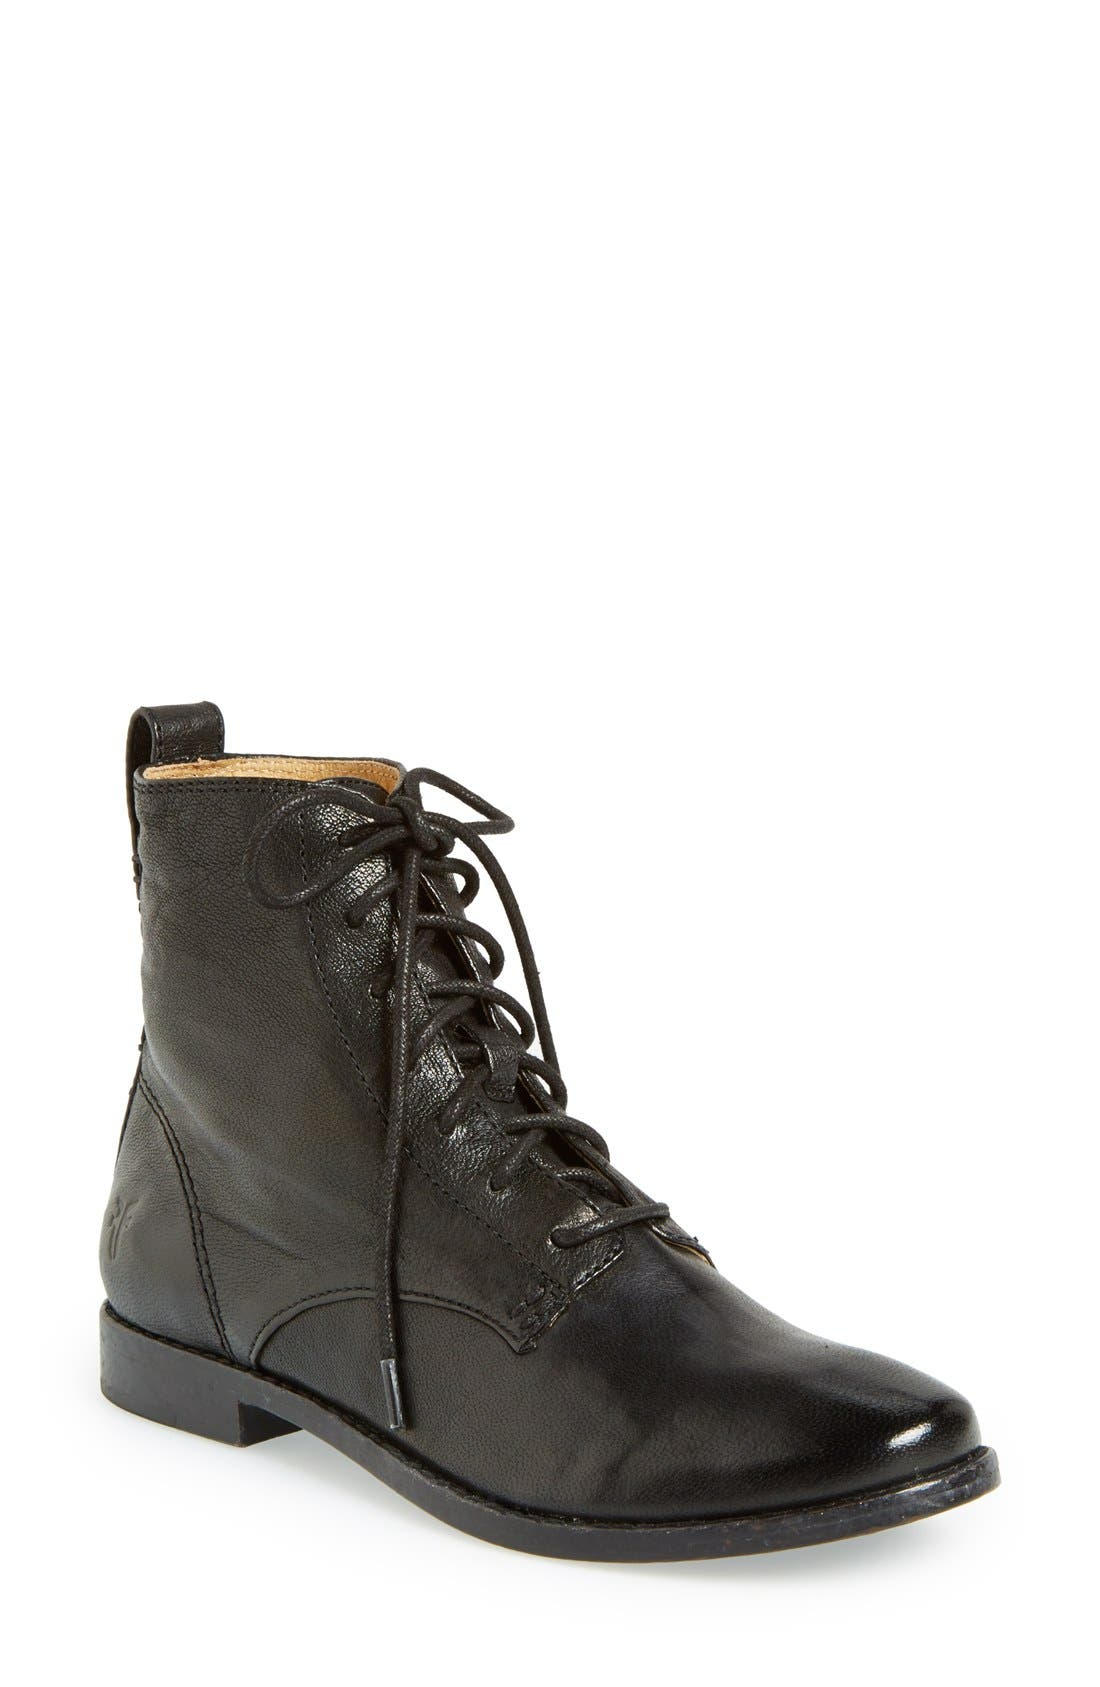 Main Image - Frye 'Anna' Lace-Up Boot (Women)